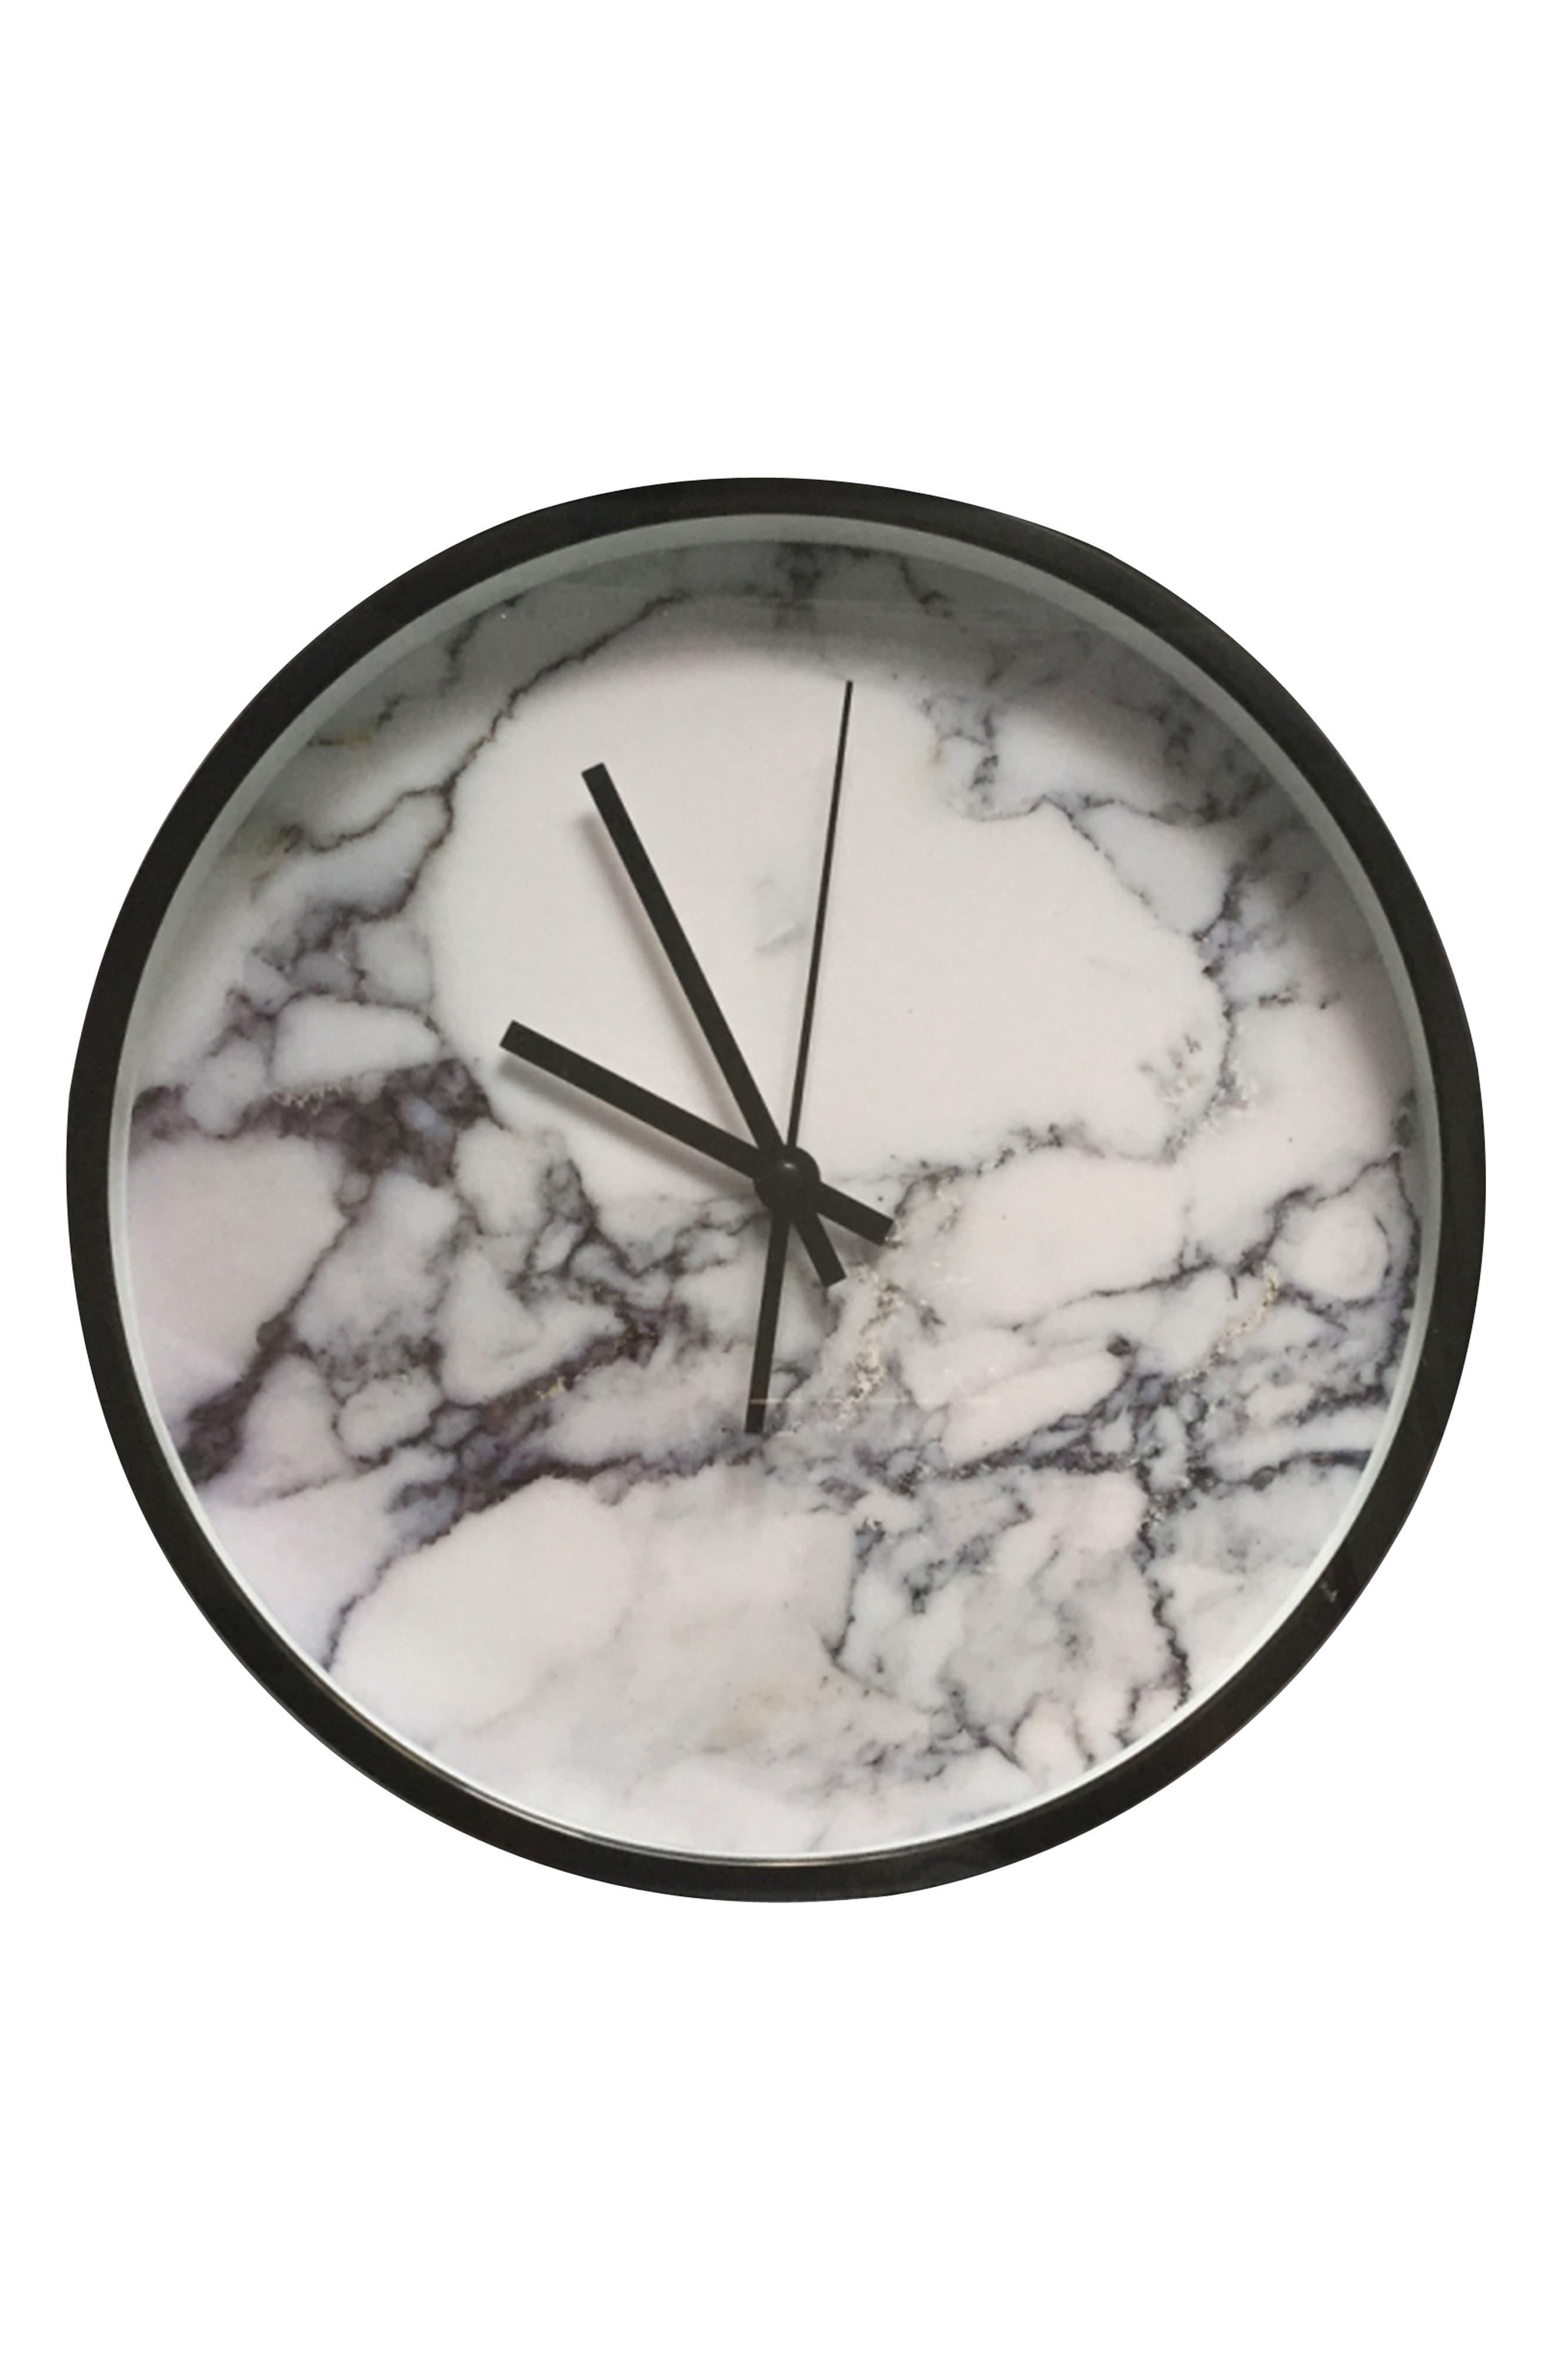 Alternate Image 1 Selected - Crystal Art Gallery Wall Clock